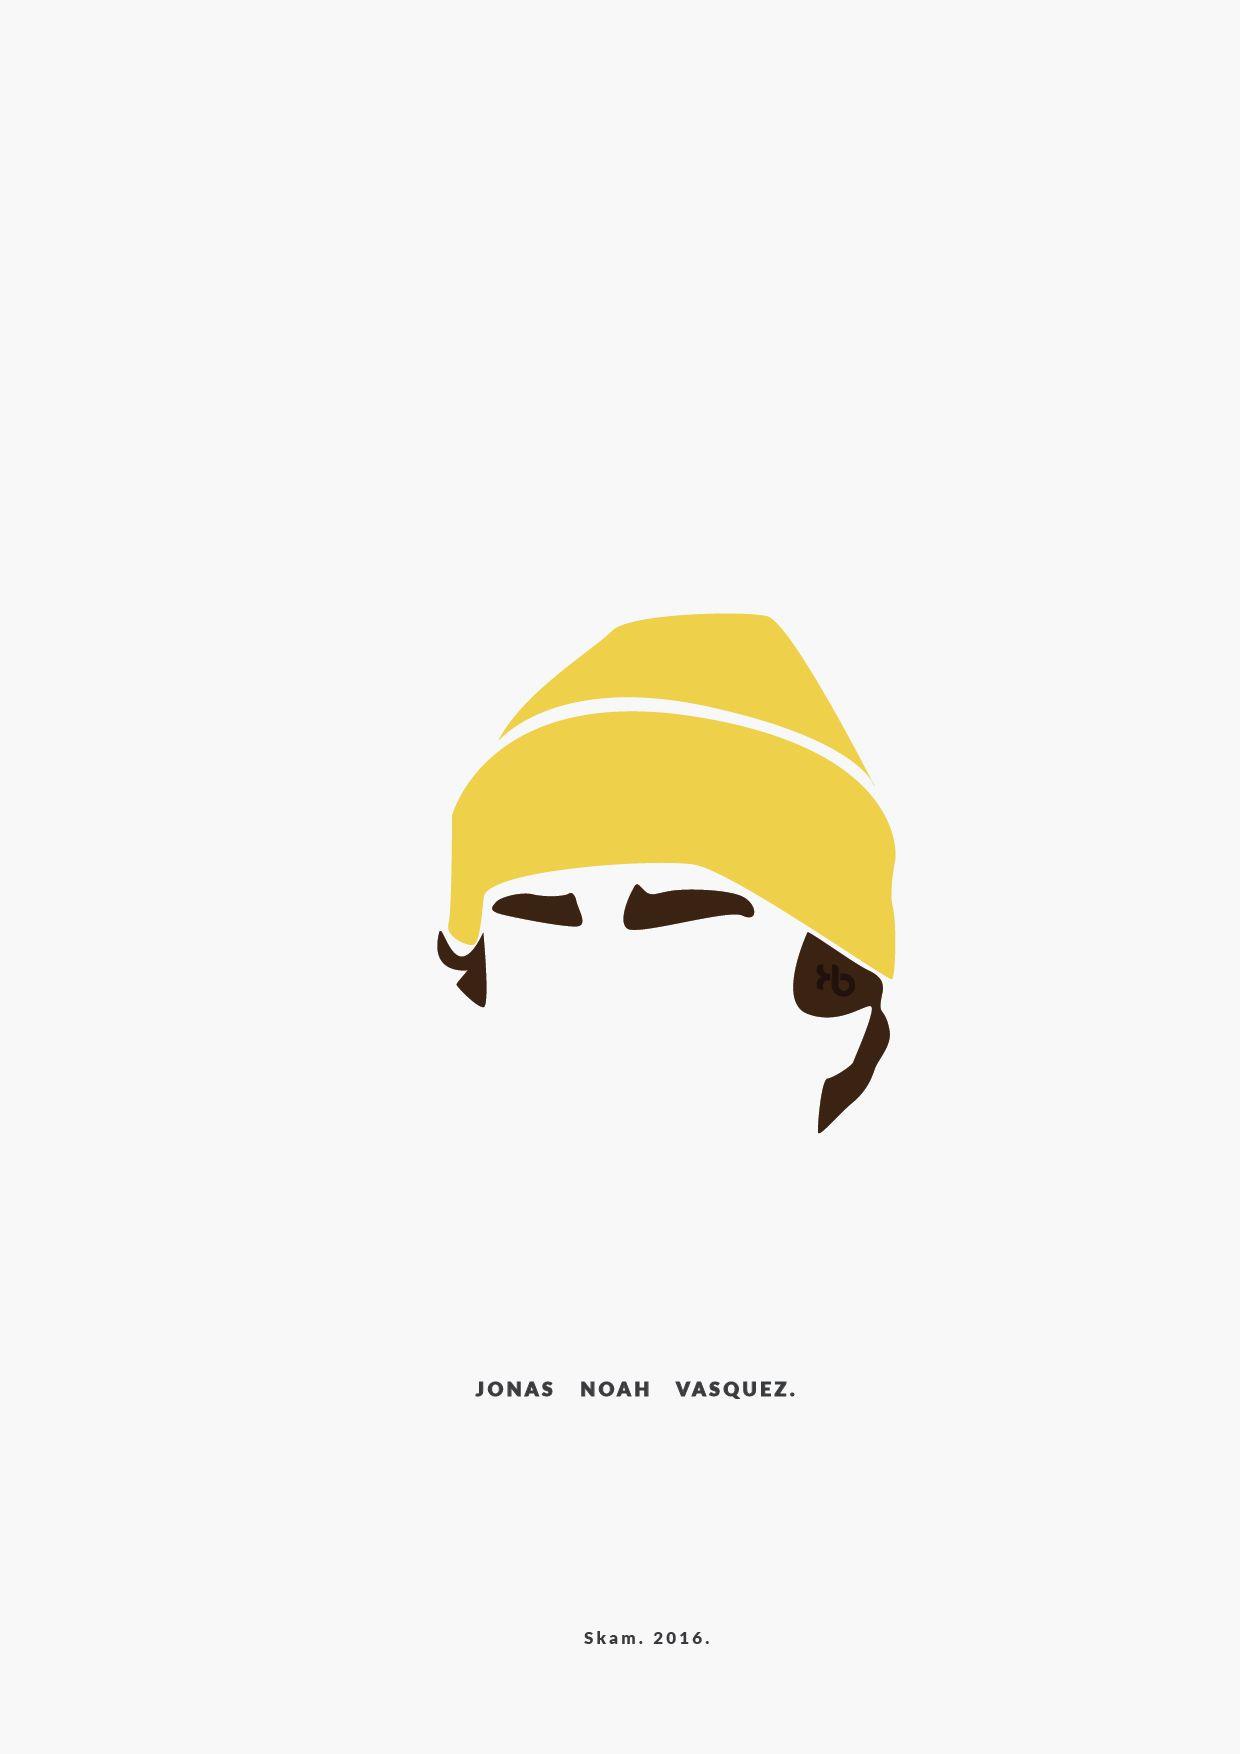 Jonas Noah Vasquez. SKAM. 2016. __________minimal project - (Part Two)